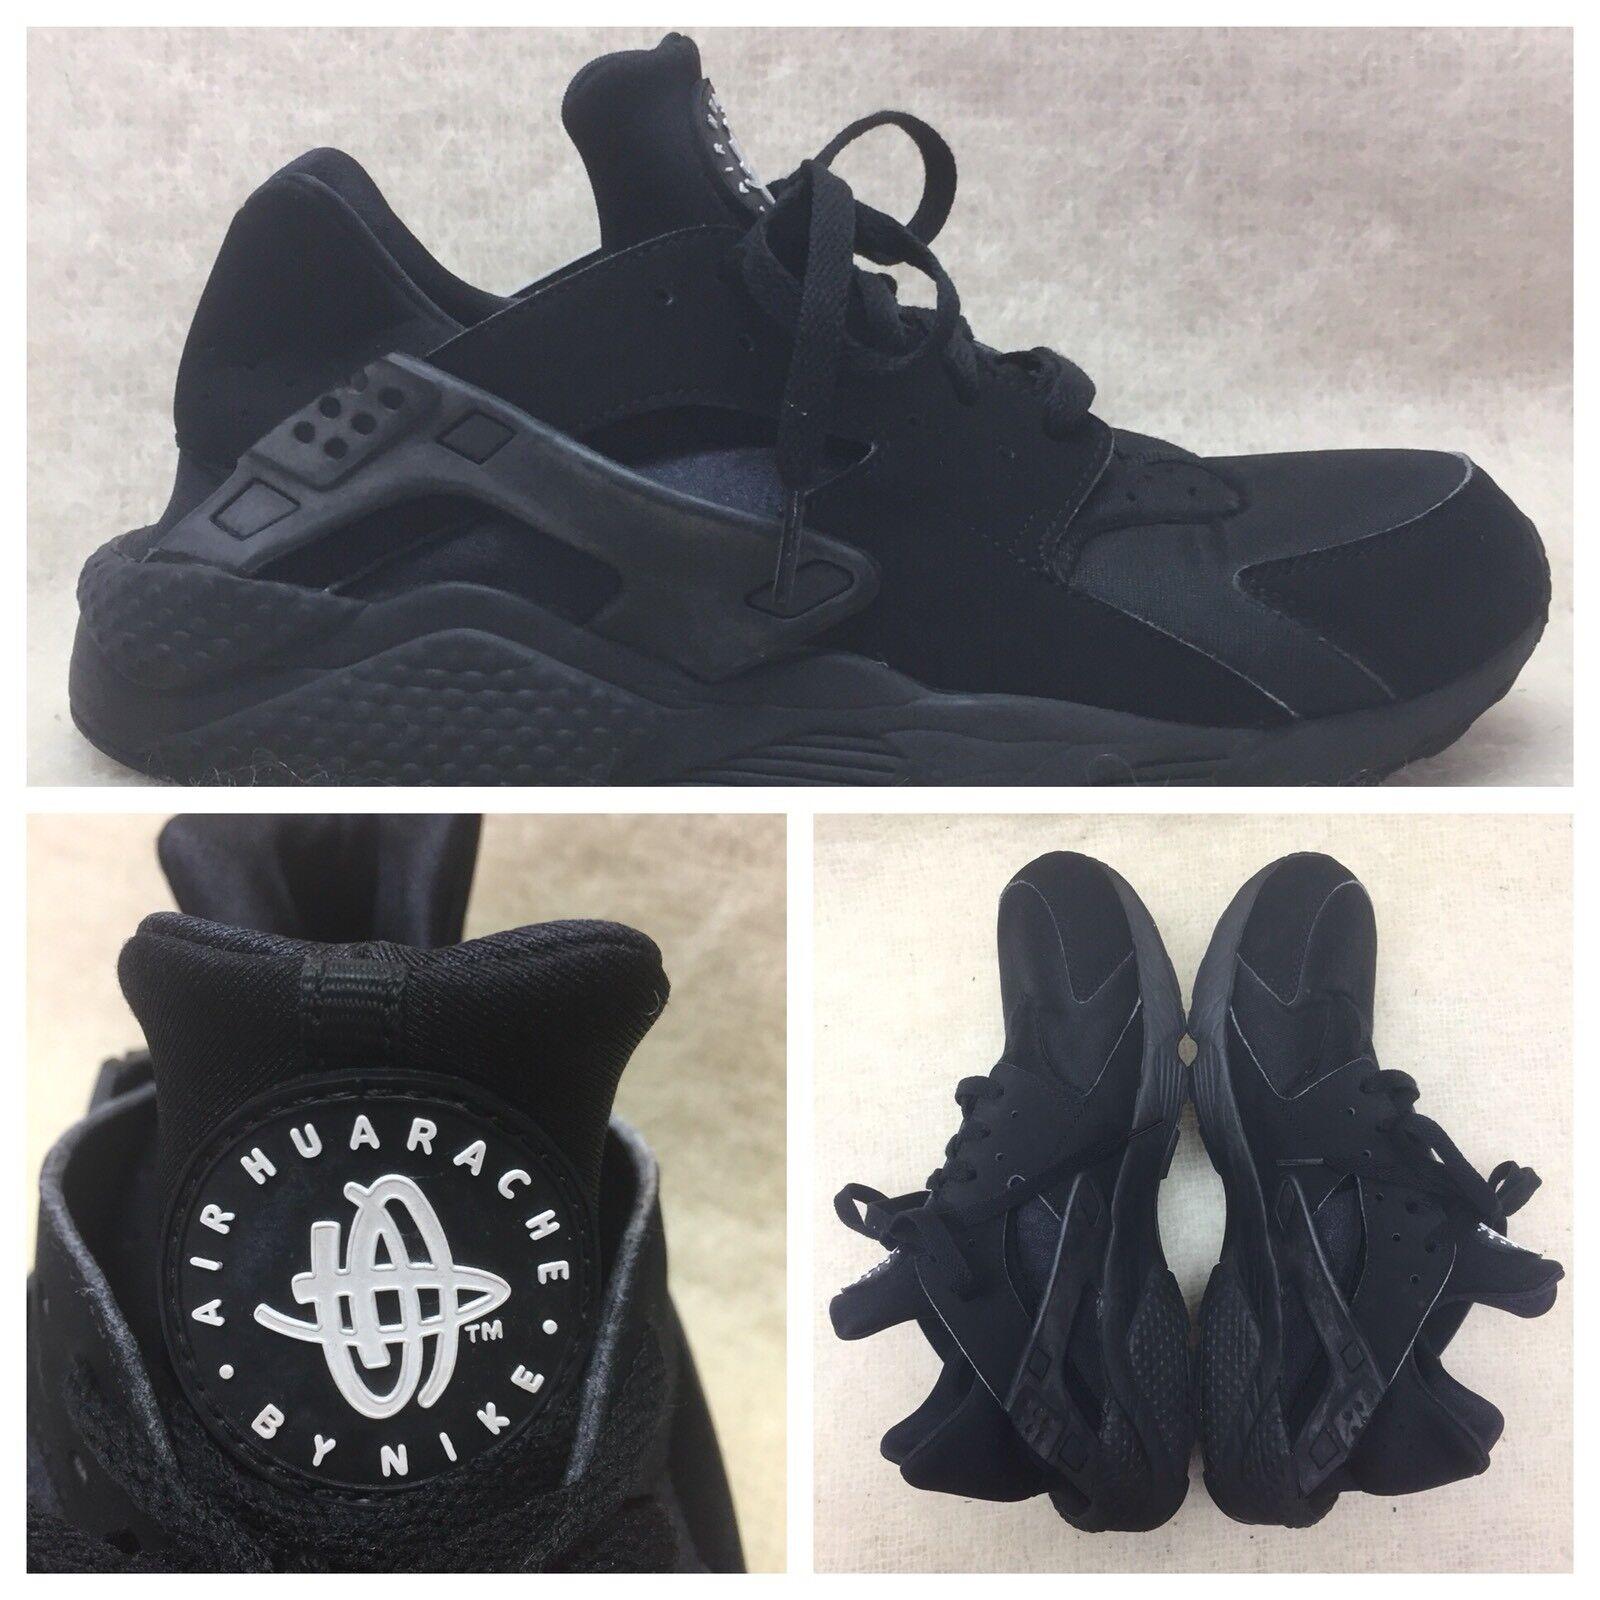 Nike Air huarache hombre running 318429-003 BLK Textile Athletic running hombre zapatos US comodo b8ff38